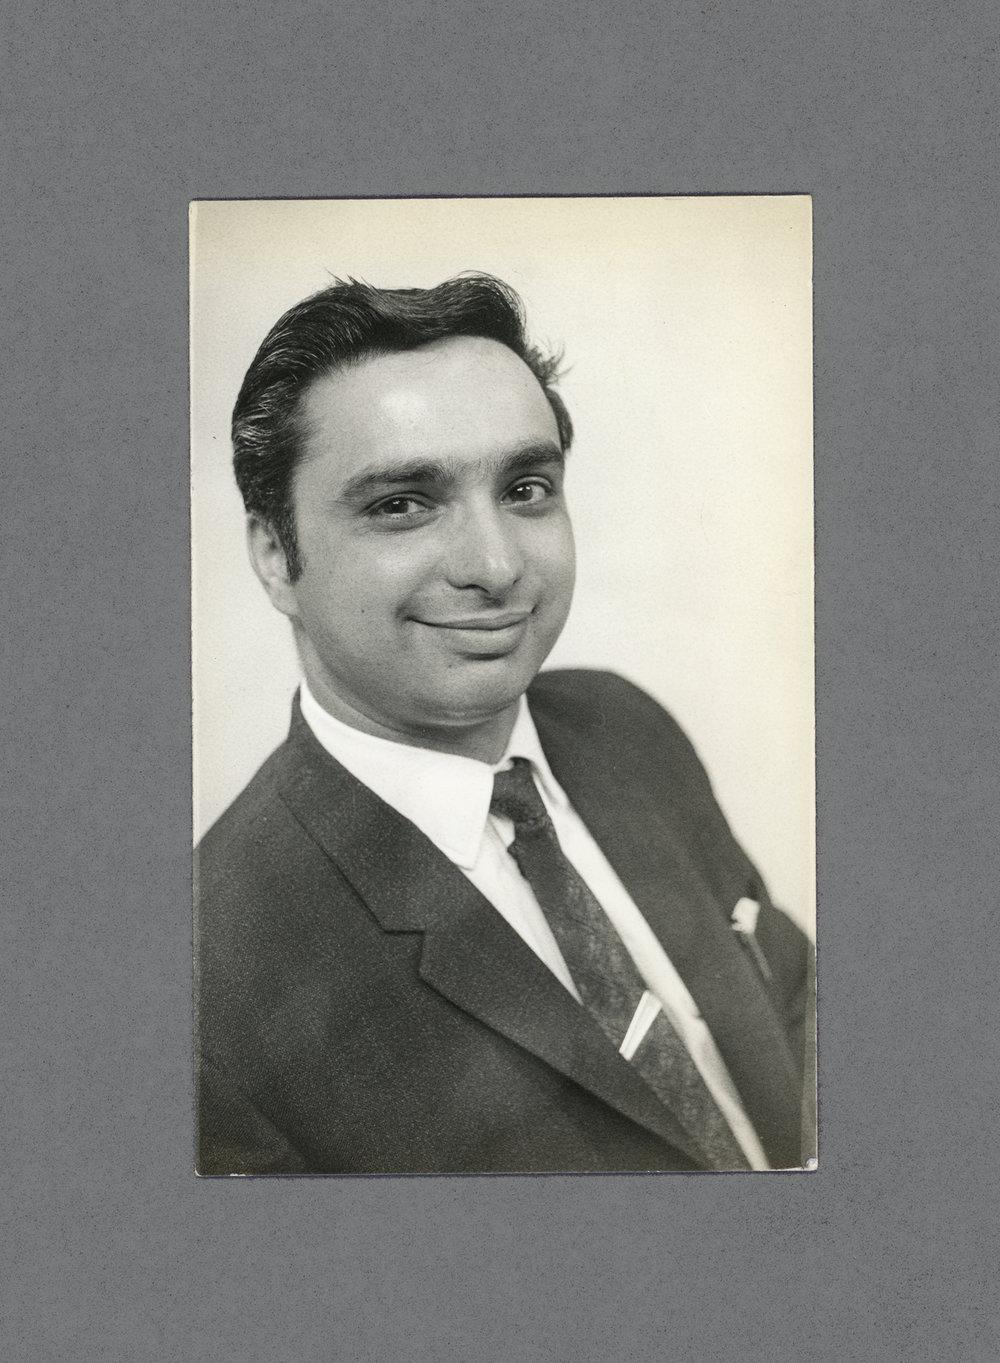 Cannock c.1967